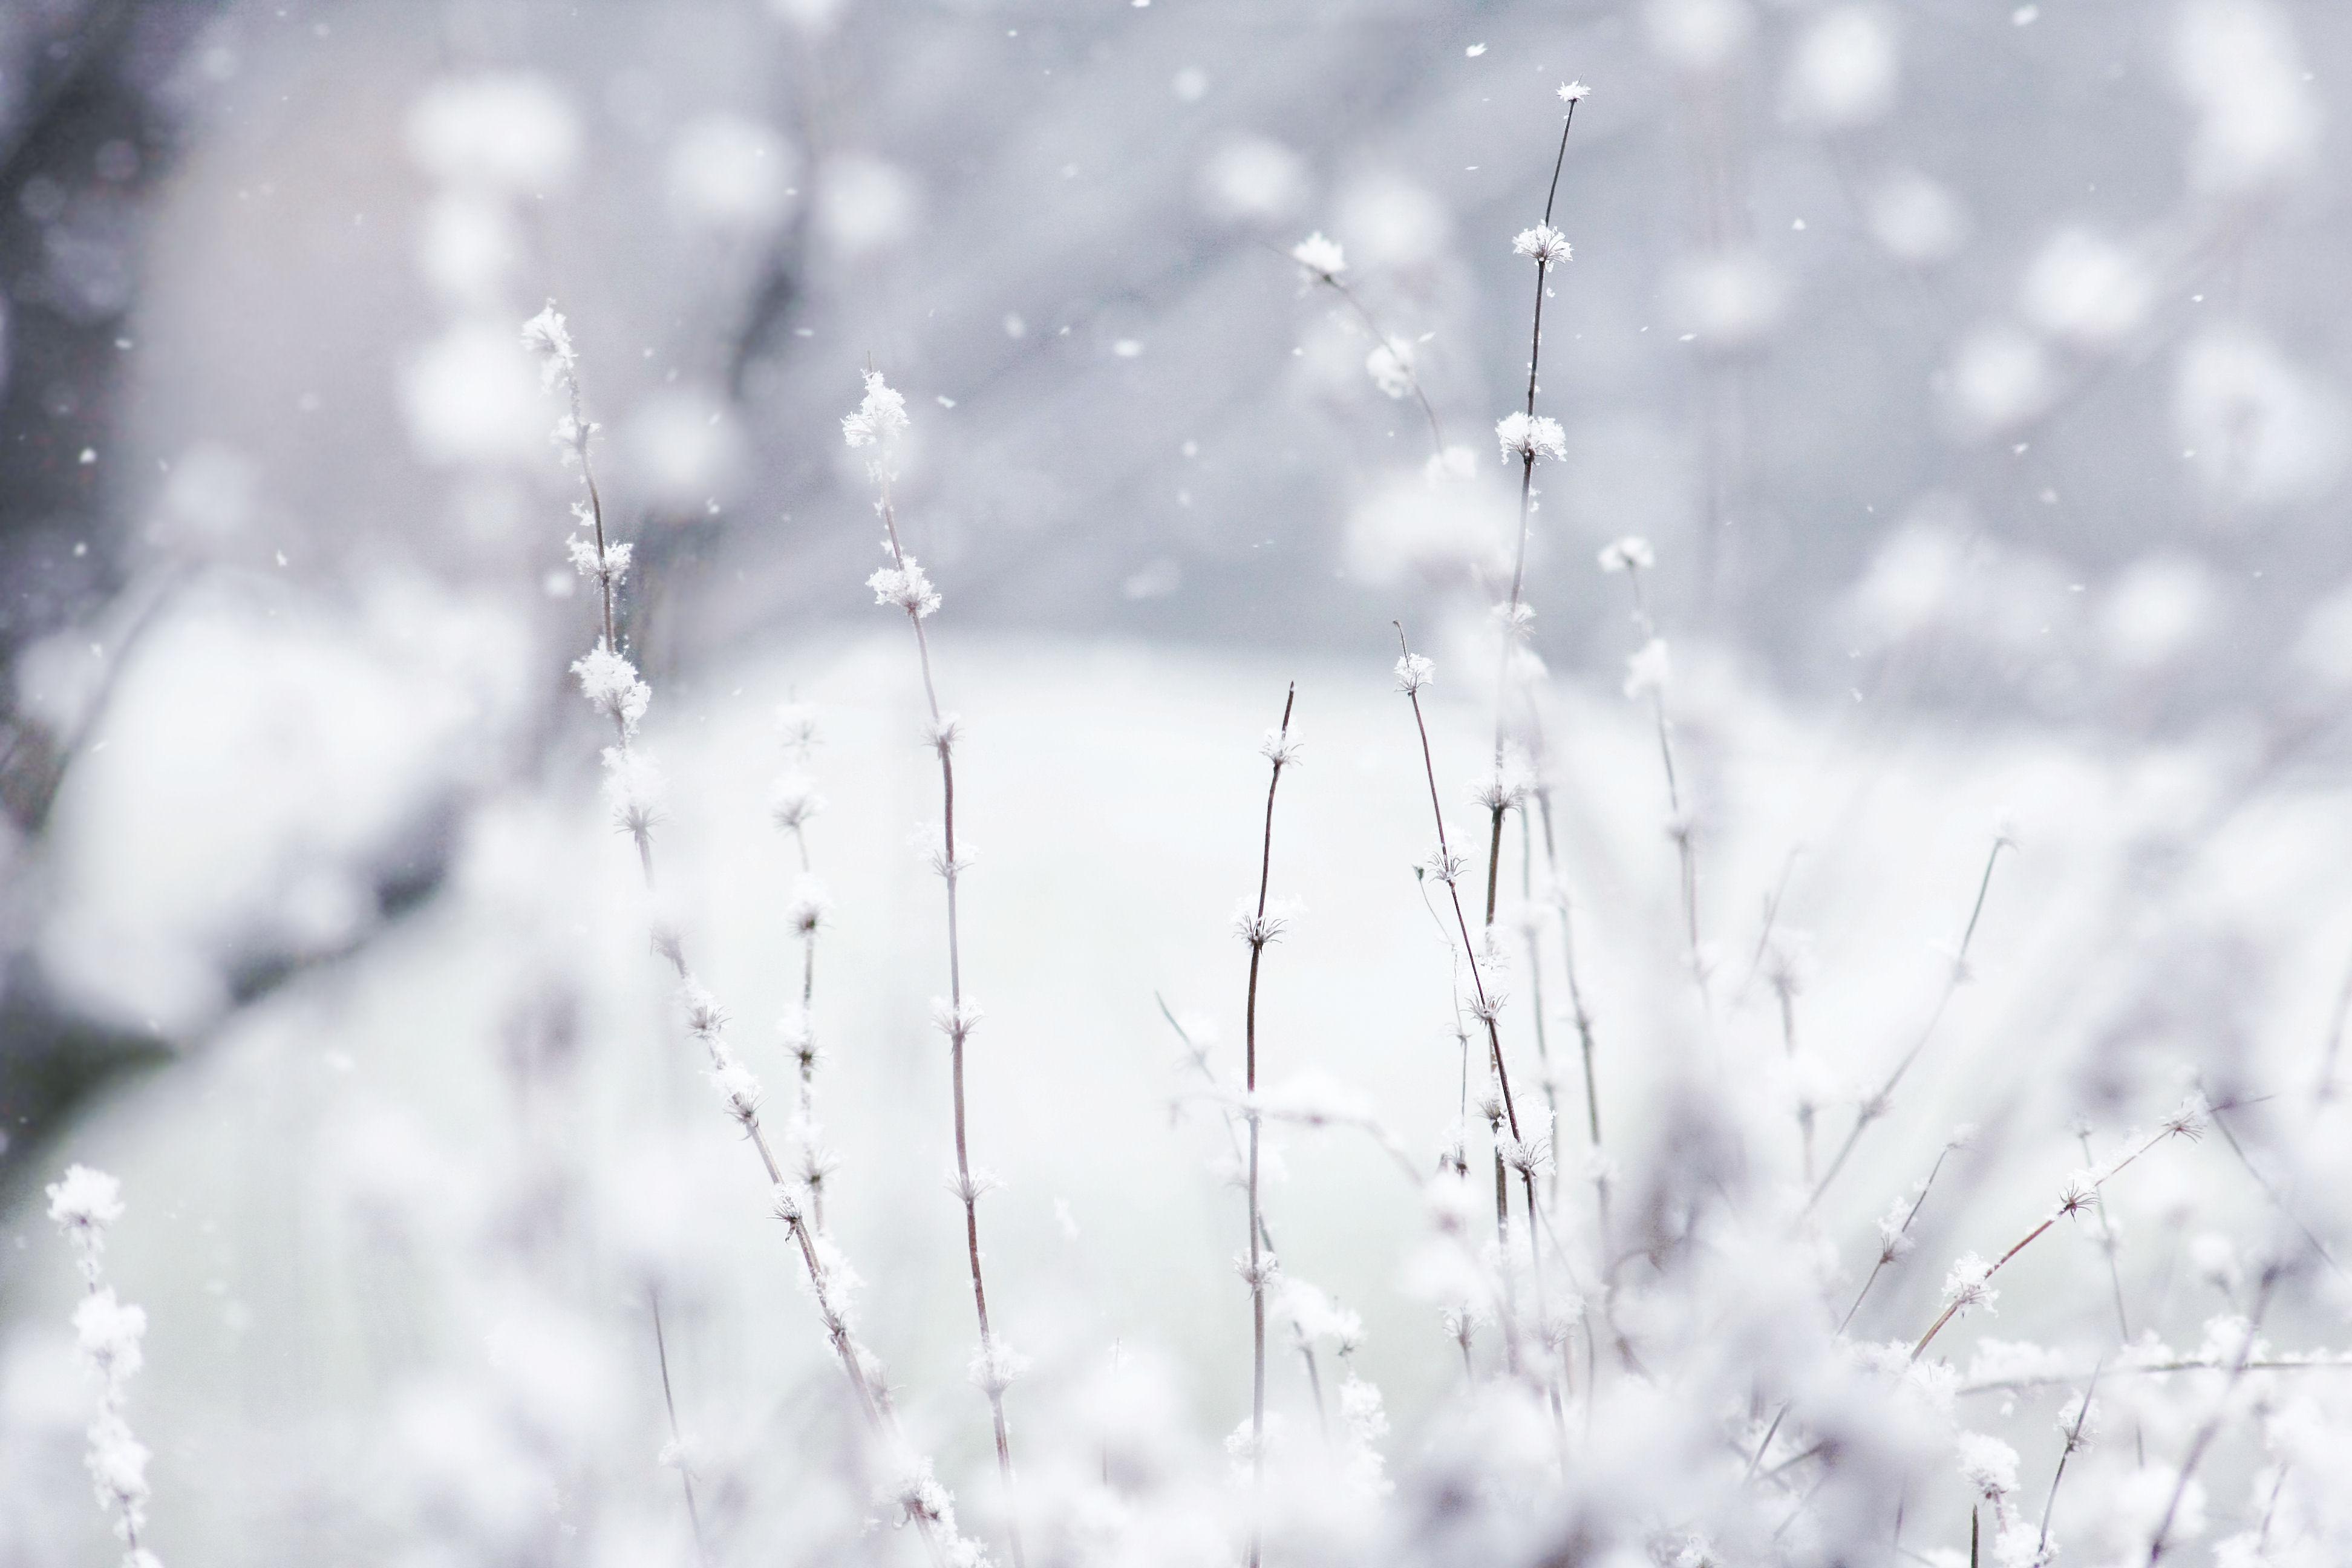 winter desktop wallpaper free